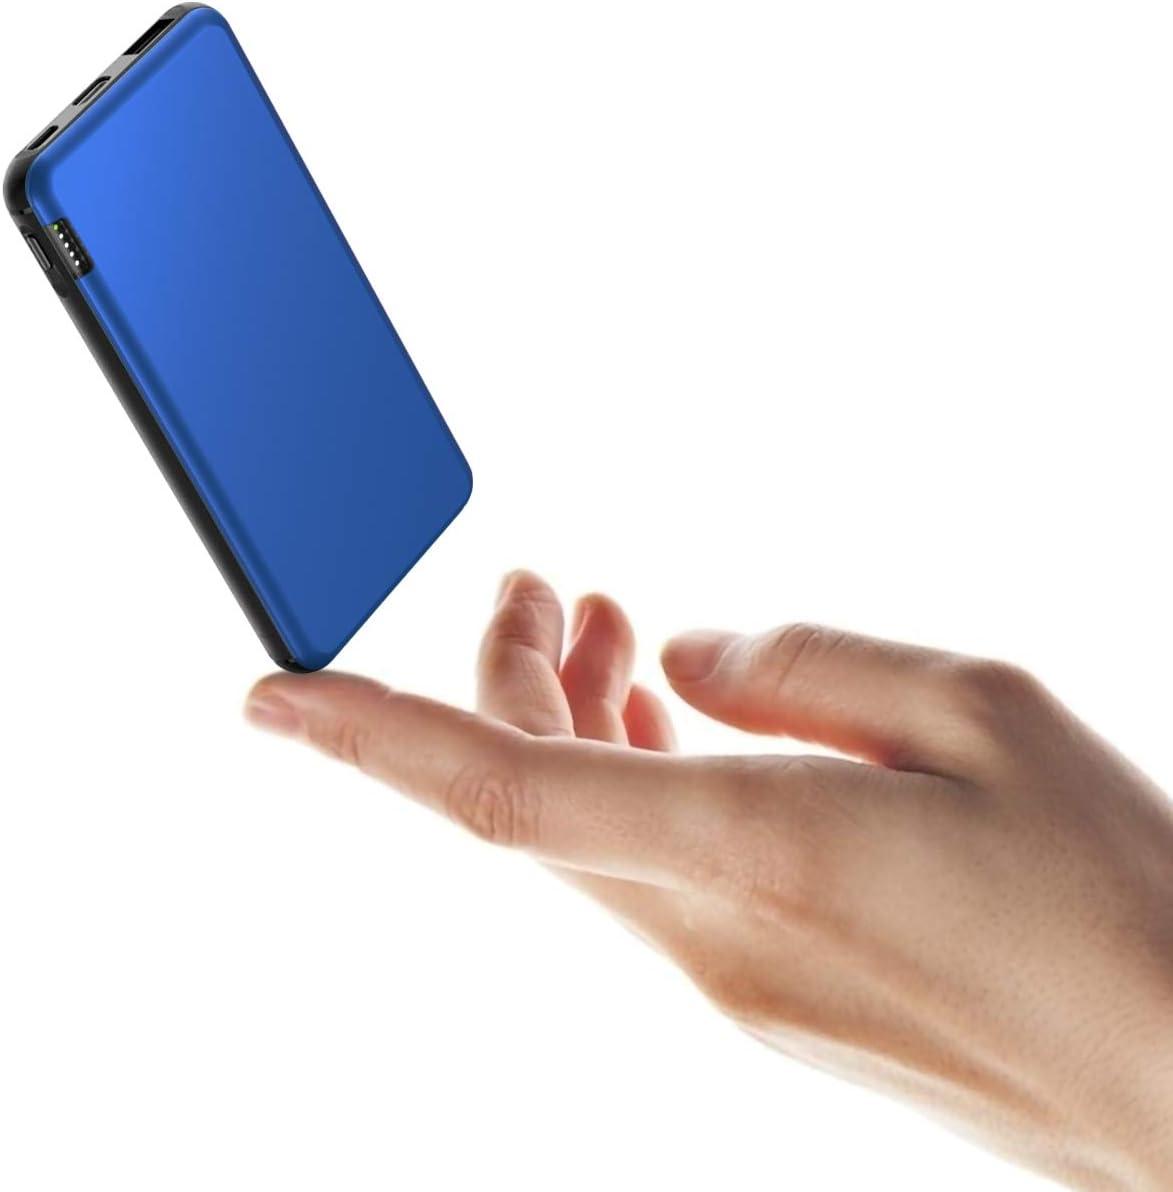 ButcHer Power Bank 10000mAh Cargador Portátil Ultra-Delgada Batería Externa Móviles con USB C & Micro Entradas y 2.4A USB Salidas para Xiaomi Redmi Samsung Huawei y Más Teléfono-Azul